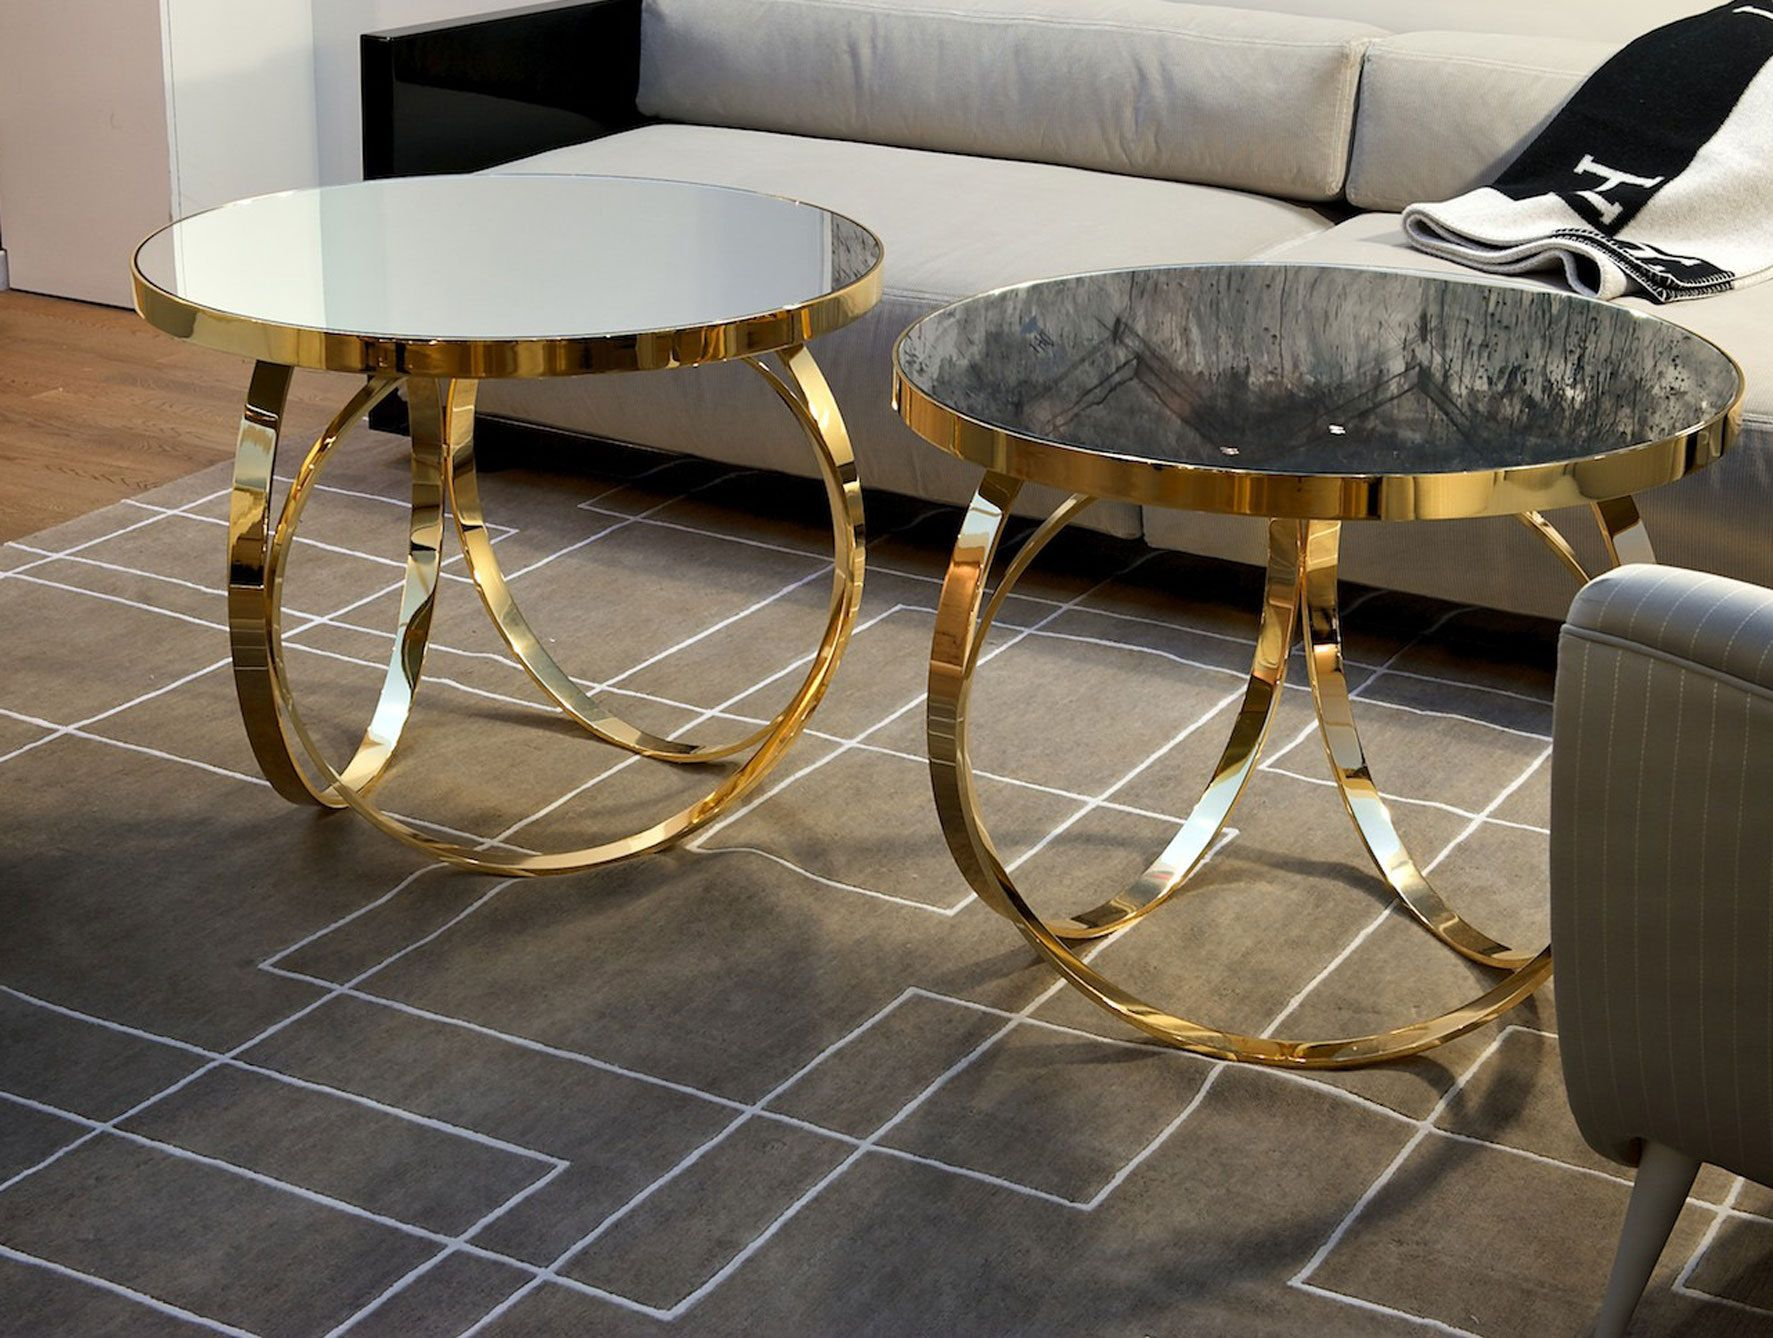 luxury coffee tables Luxury Coffee Tables by Nella Vetrina d1e6af203026744aac887d9856fc5949